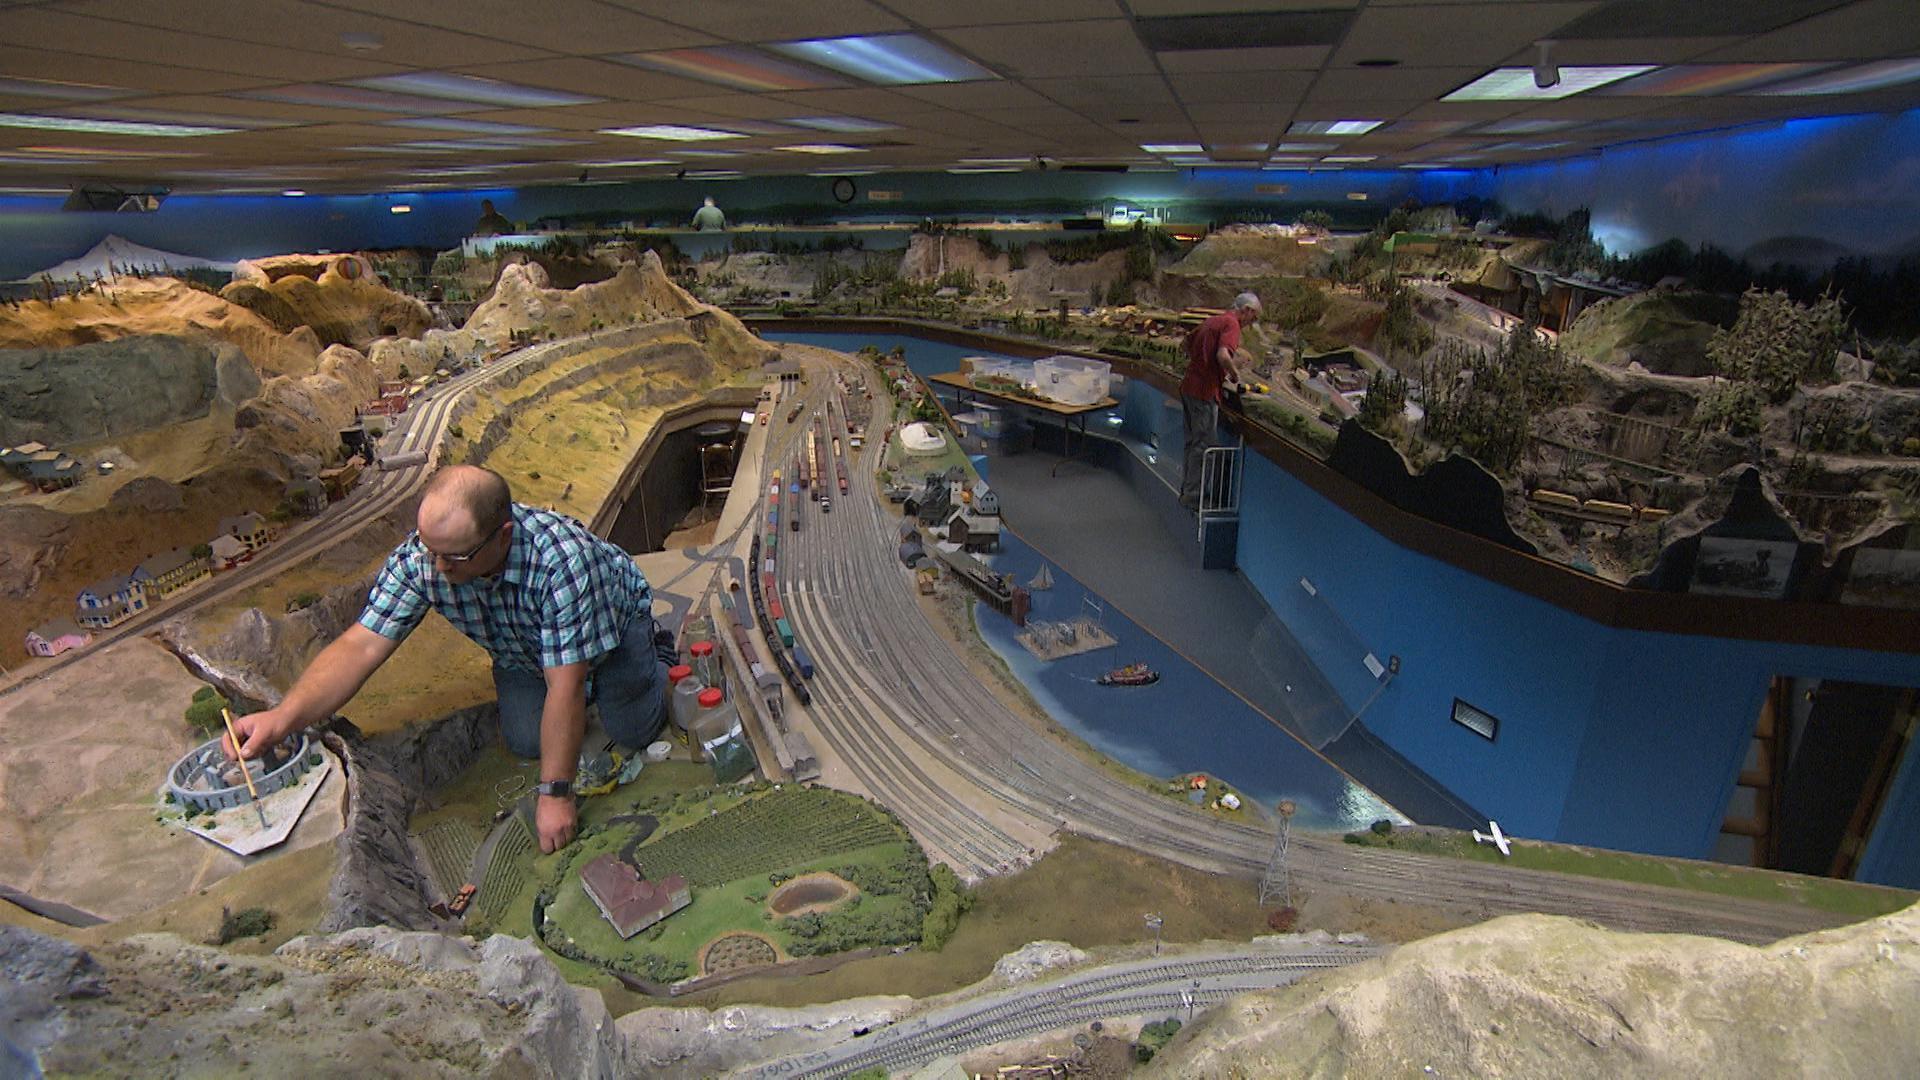 Honey I Shrunk The Gorge Model Railroad Re Creates Iconic Region Opb